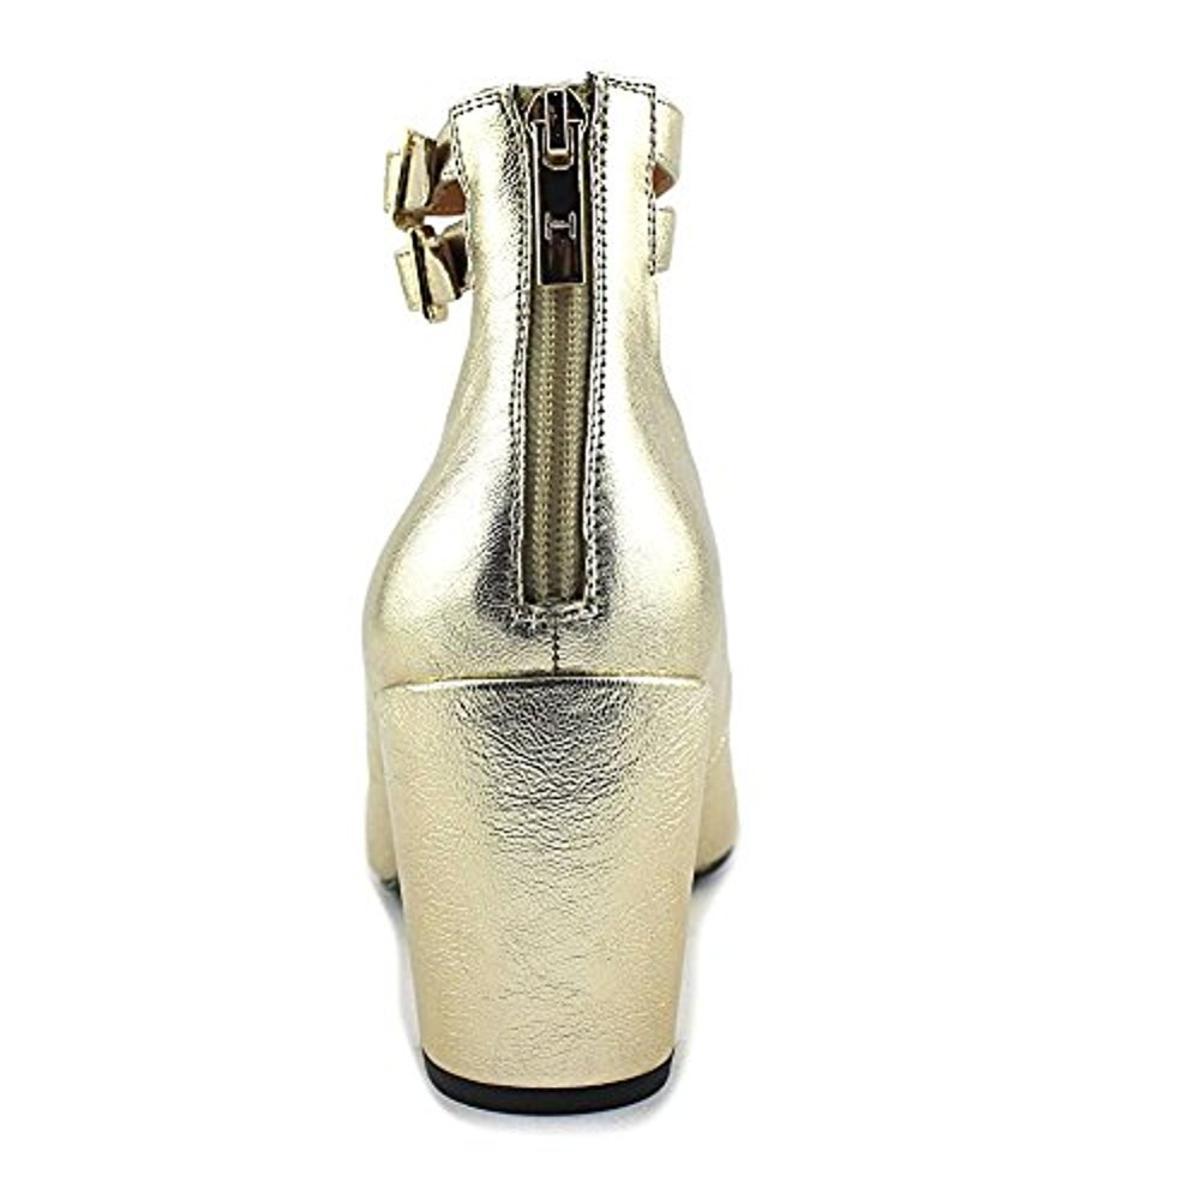 H Halston Damenschuhe Regina Square Toe Toe Square Dress Ankle Strap Block Heels Schuhes BHFO 3901 8a7daa